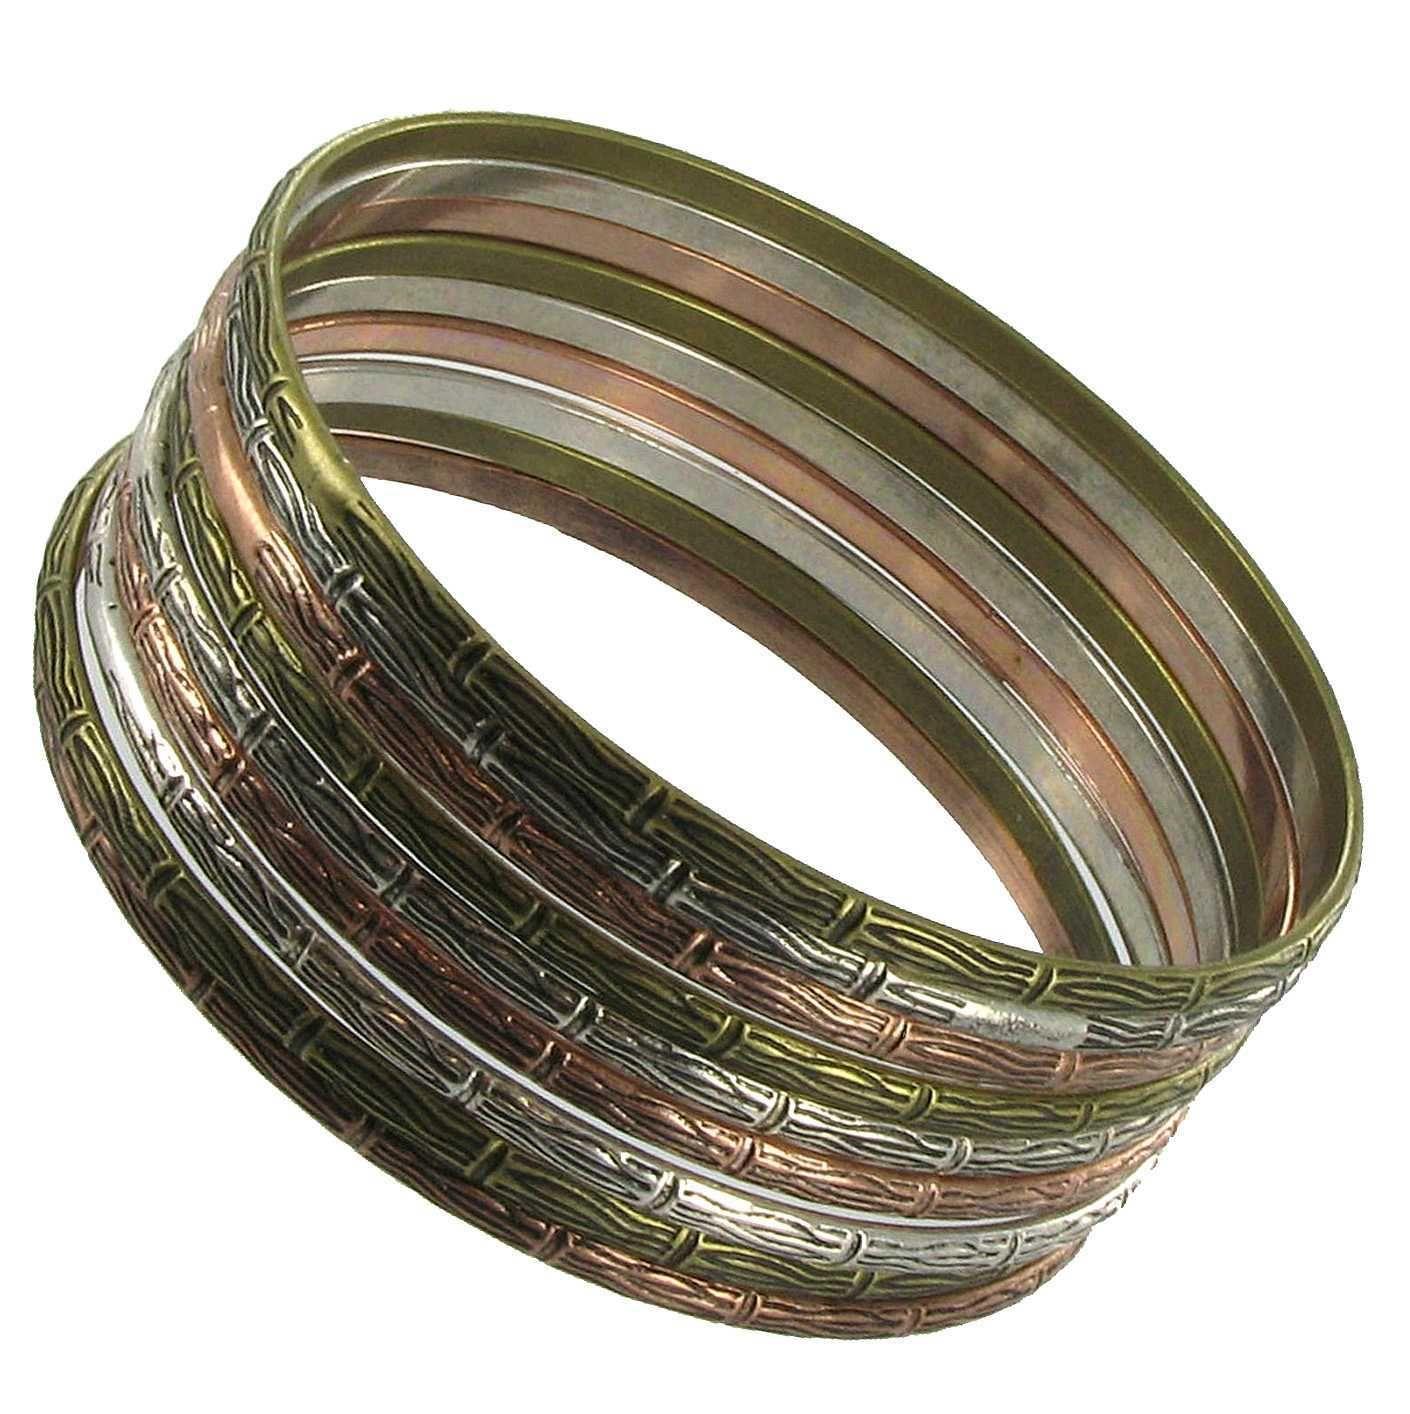 Set of 9 Bangle Bracelets inCopper Gold Silver Tone Thin Metal design.  Fun to wear.